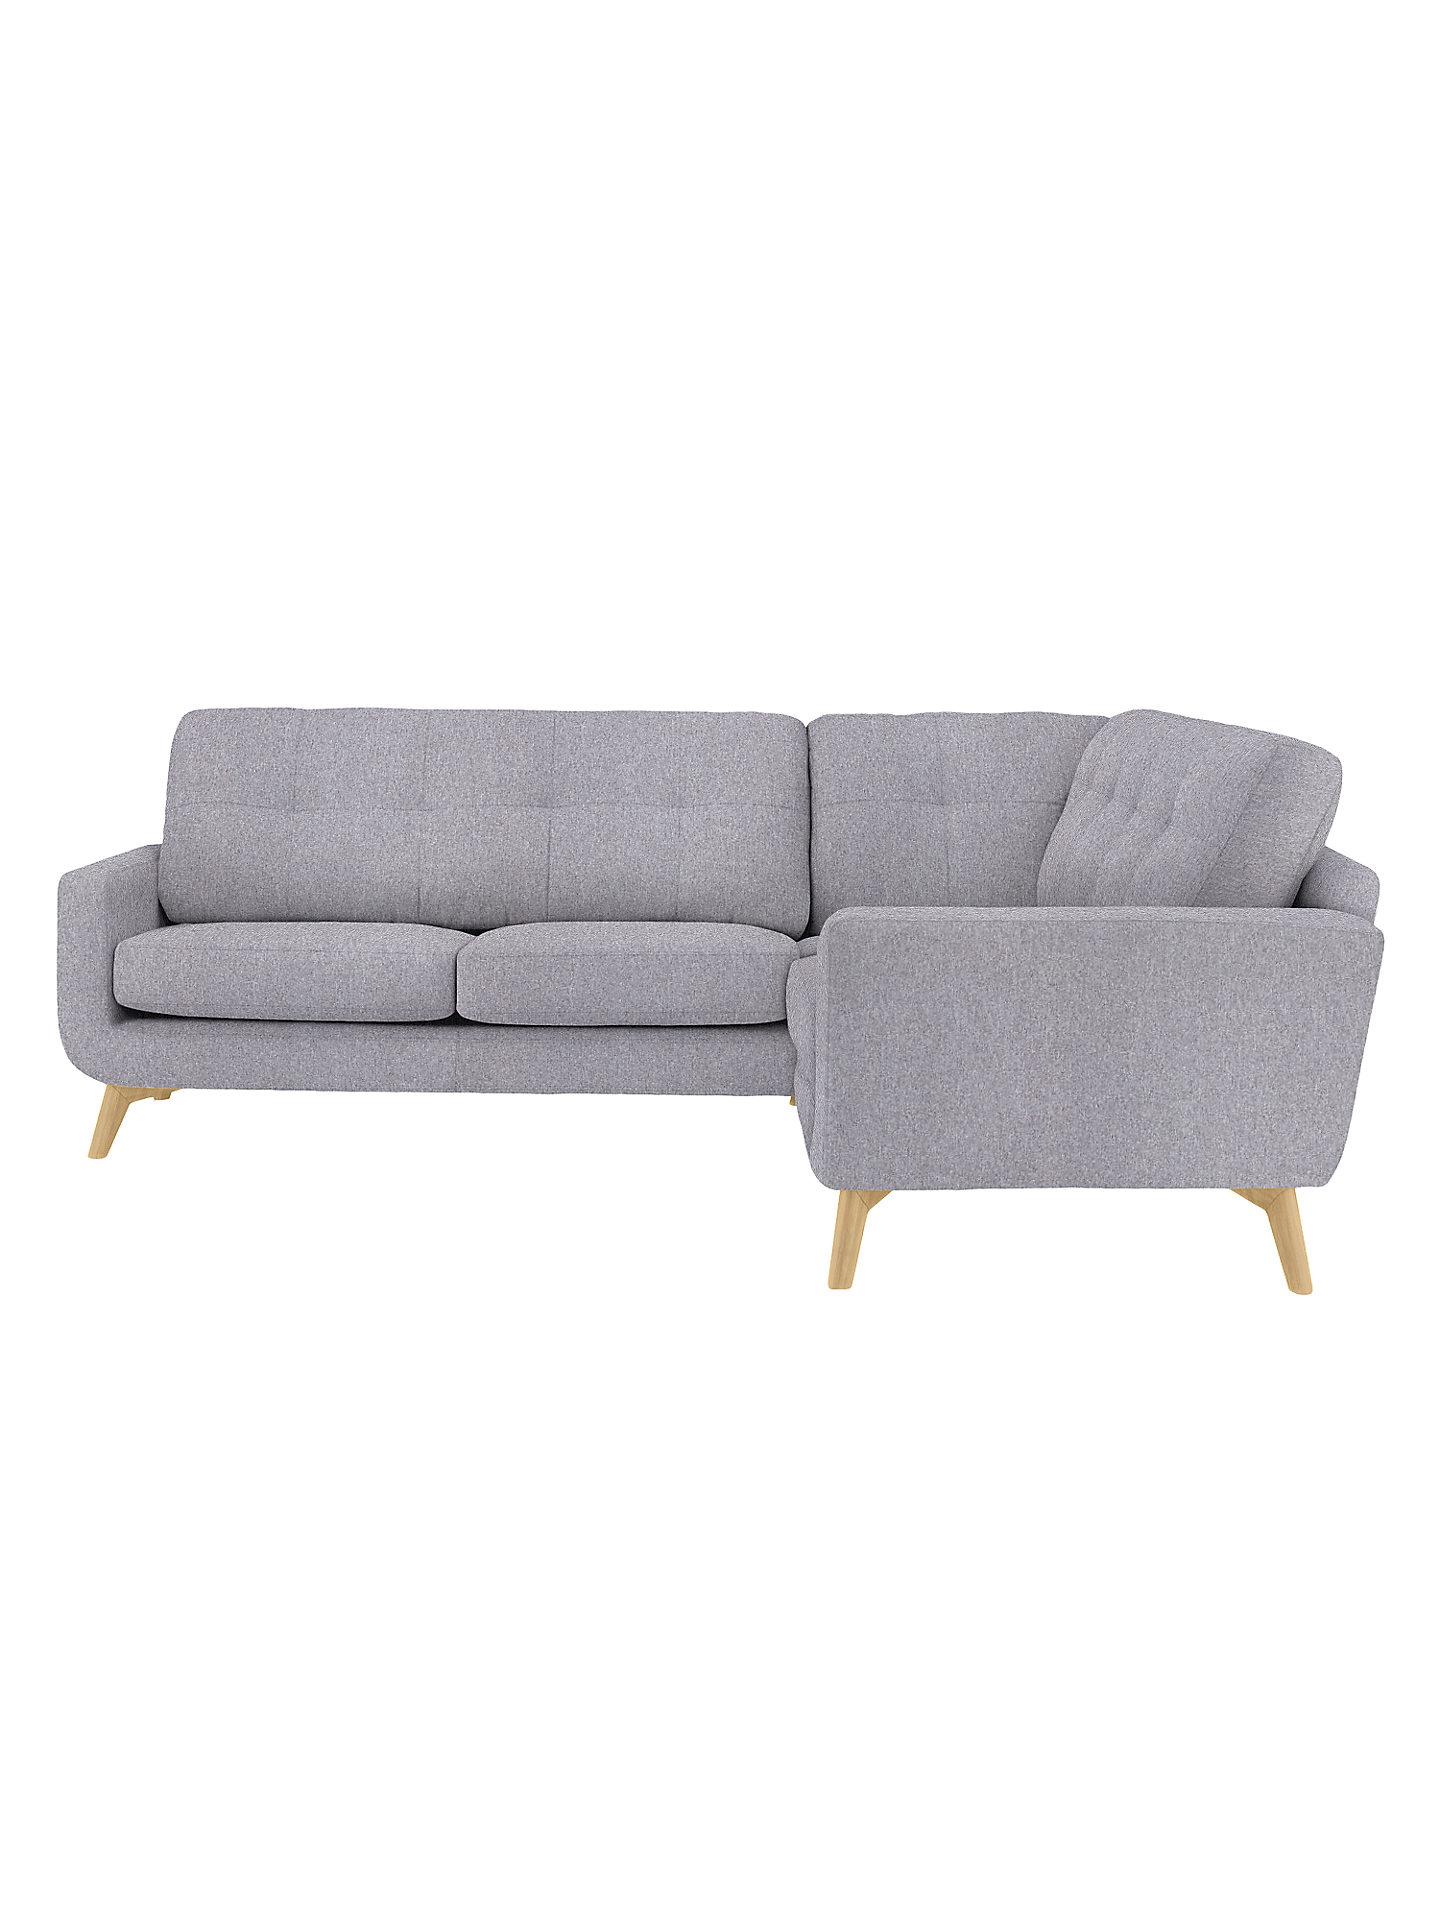 Buy John Lewis & Partners Barbican RHF Corner End Sofa Online at johnlewis.com